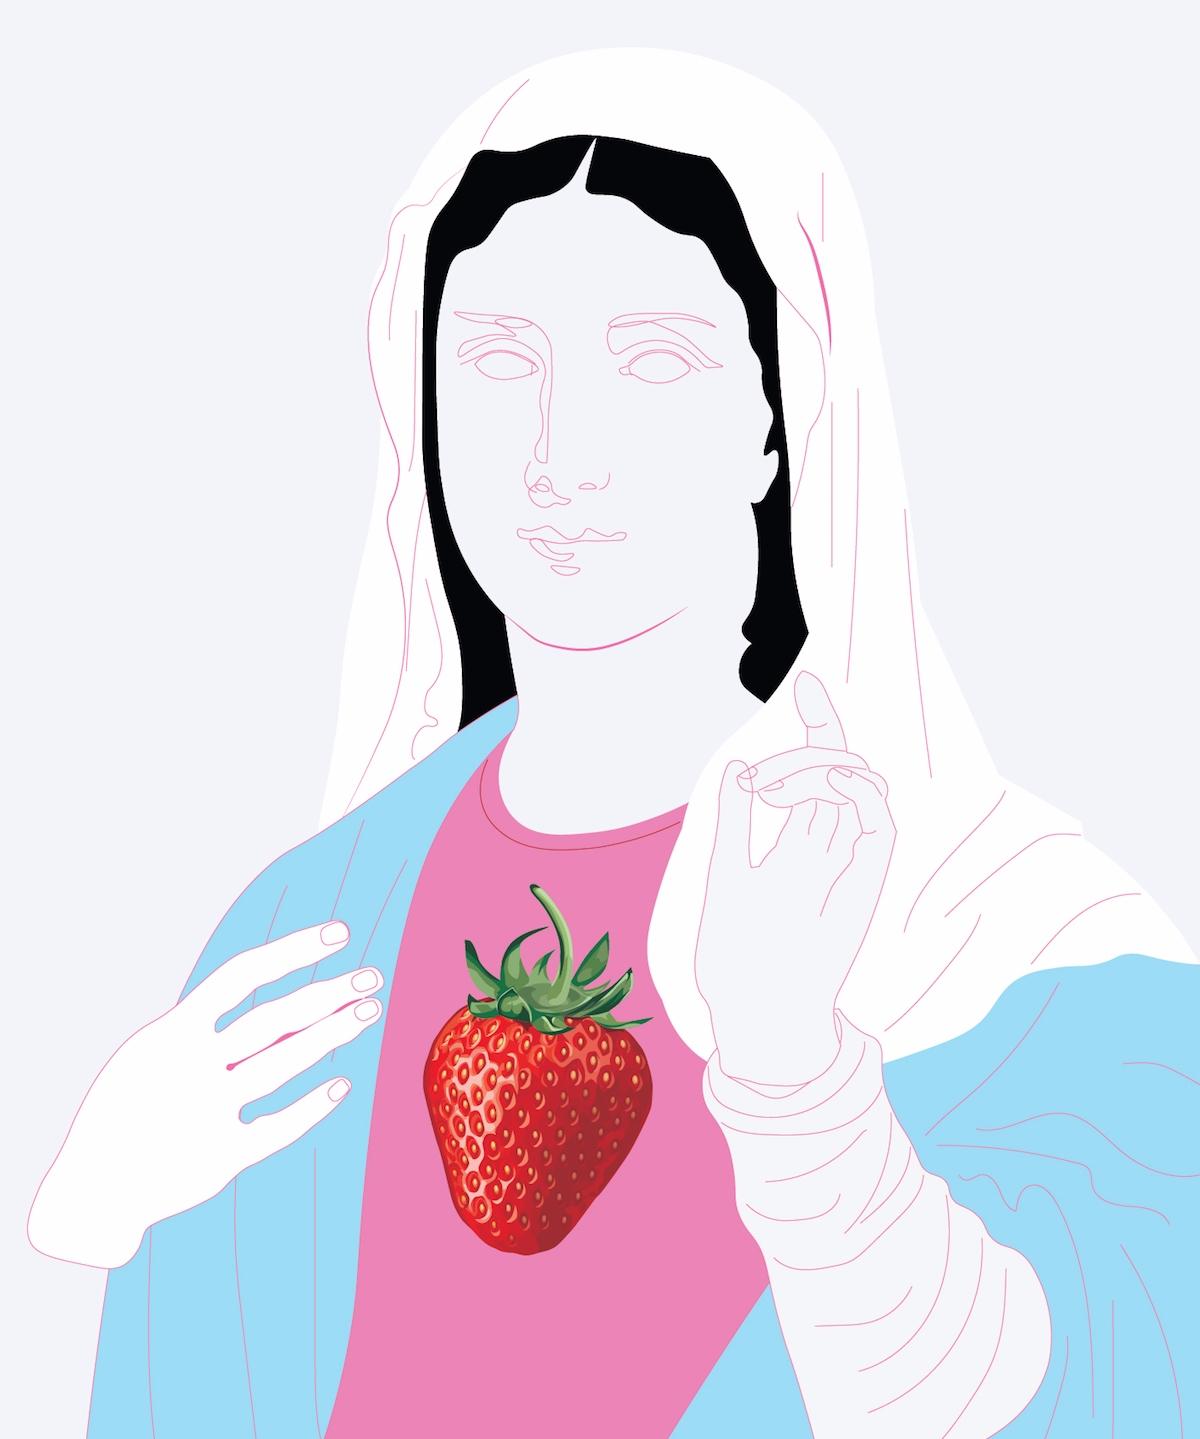 Strawberry feels N2 2d doodle s - sandromartini | ello